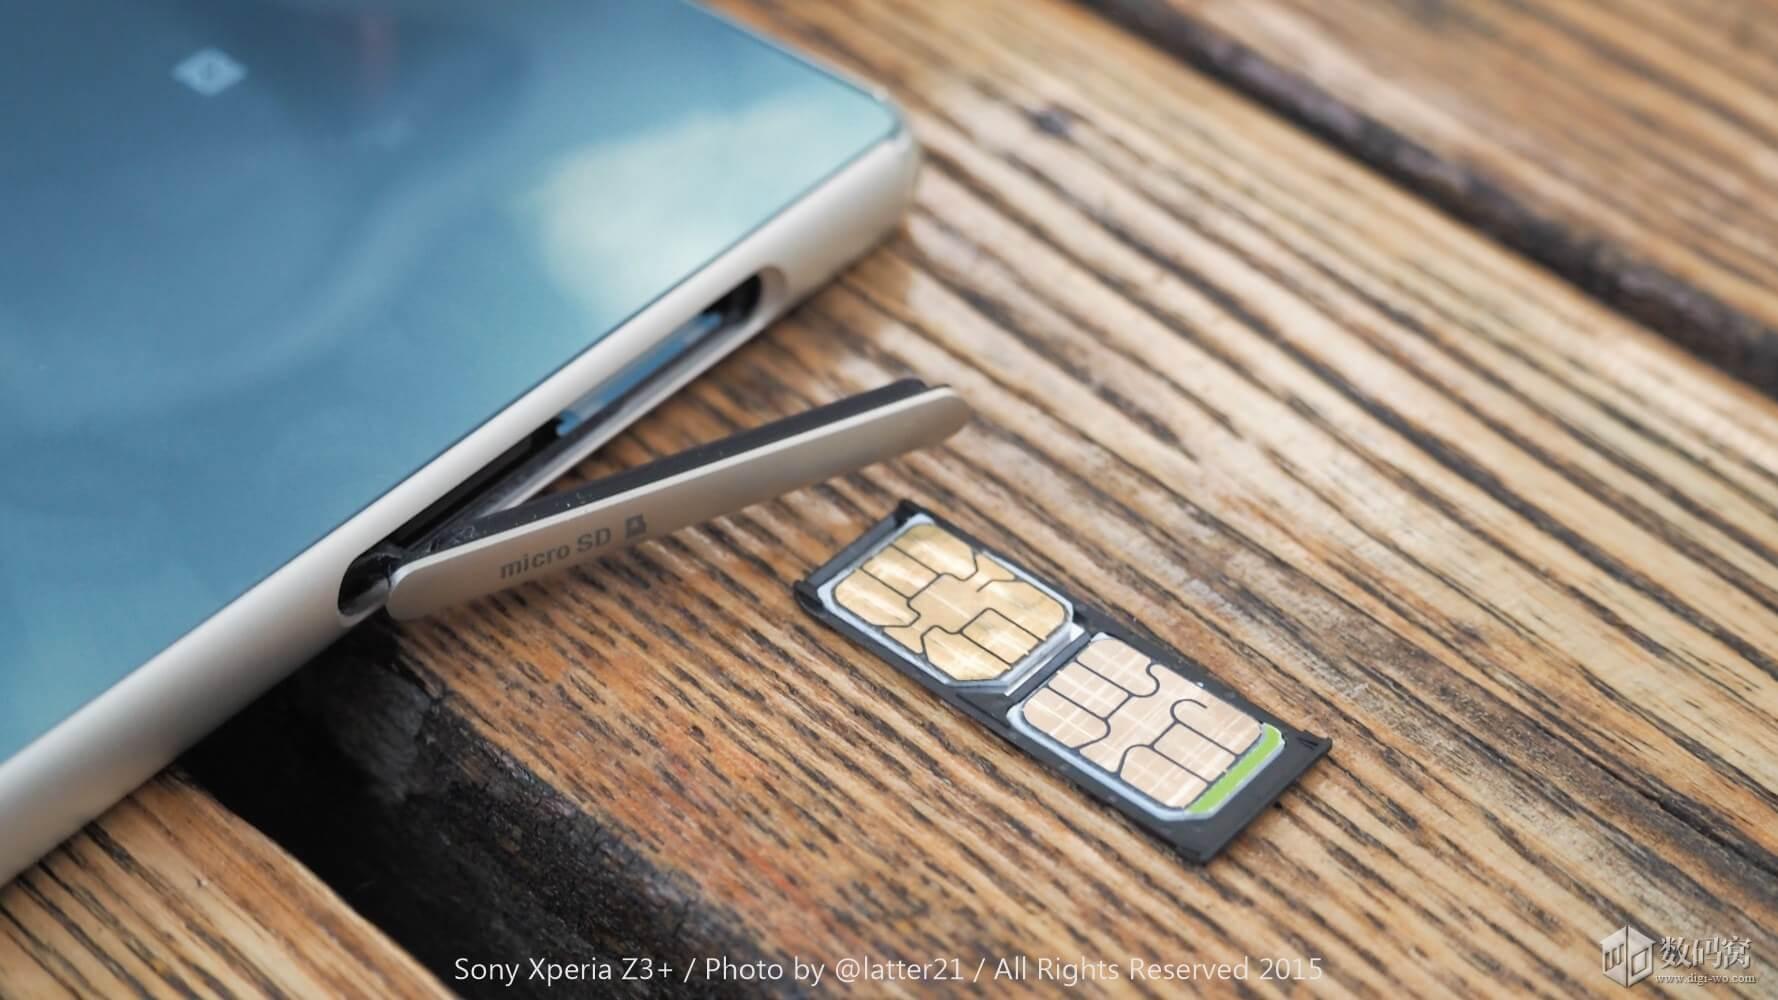 Dual SIM Xperia Z3+